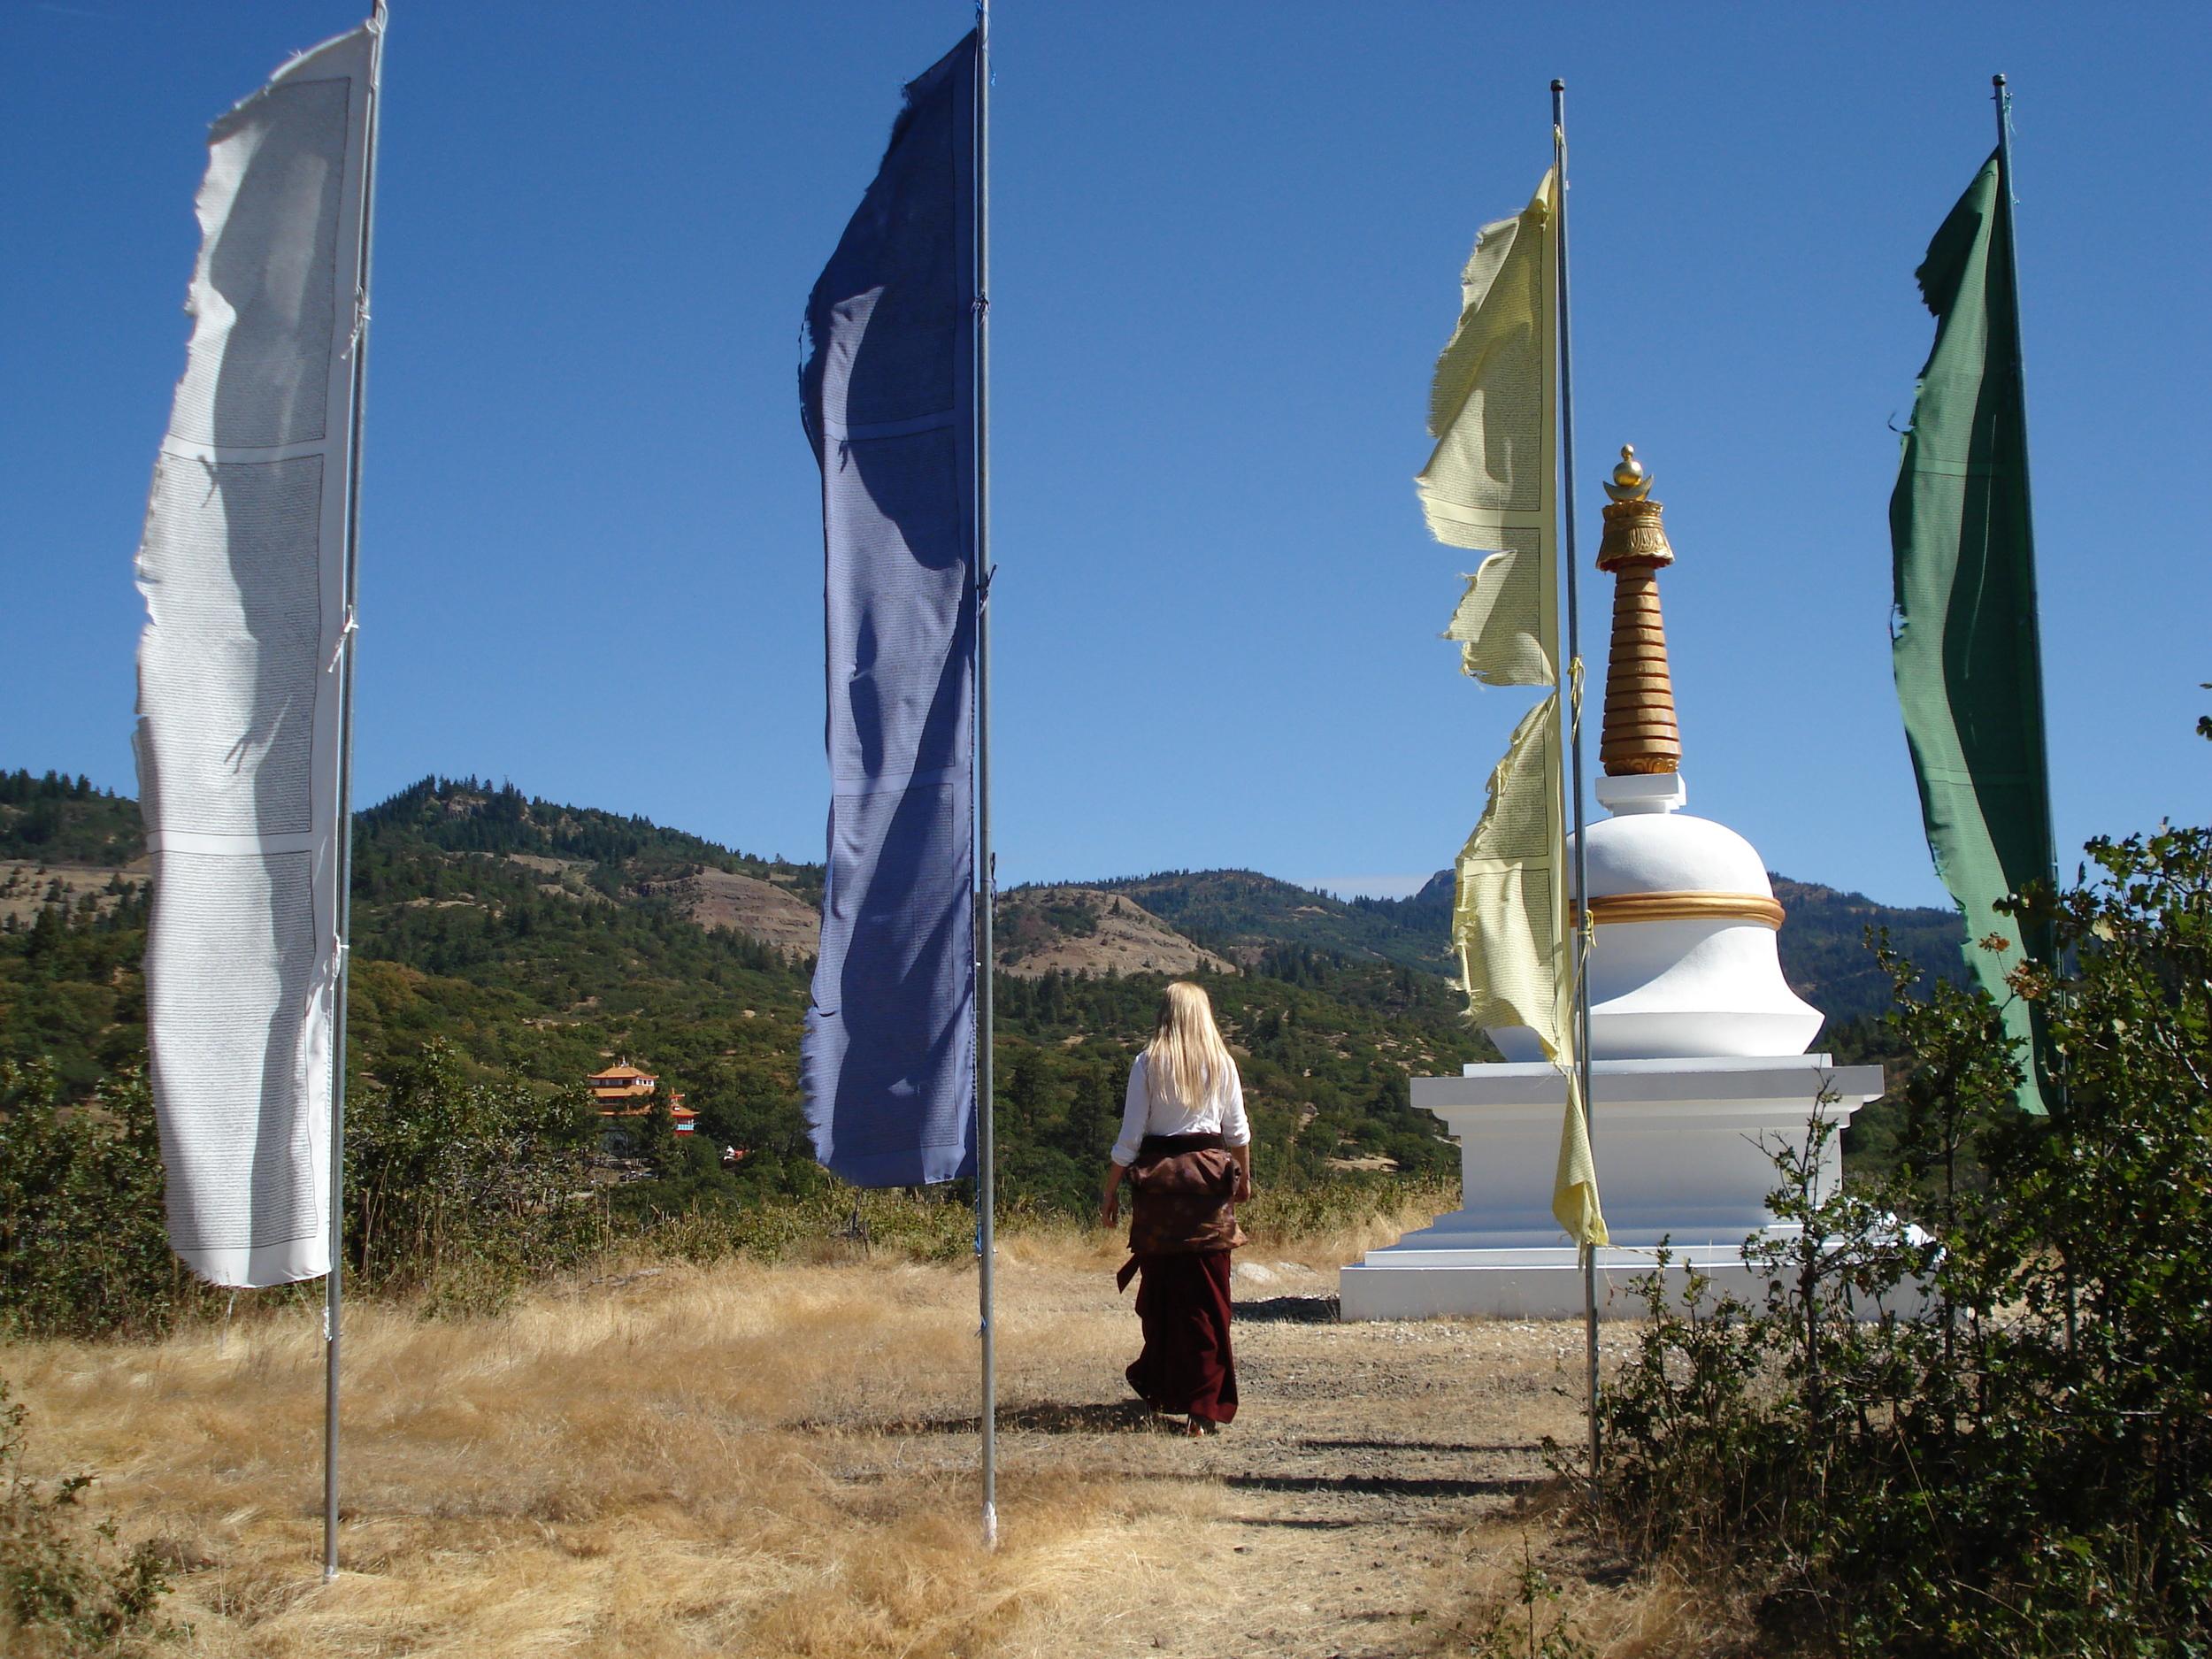 Sangye Khandro on her retreat land in Oregon